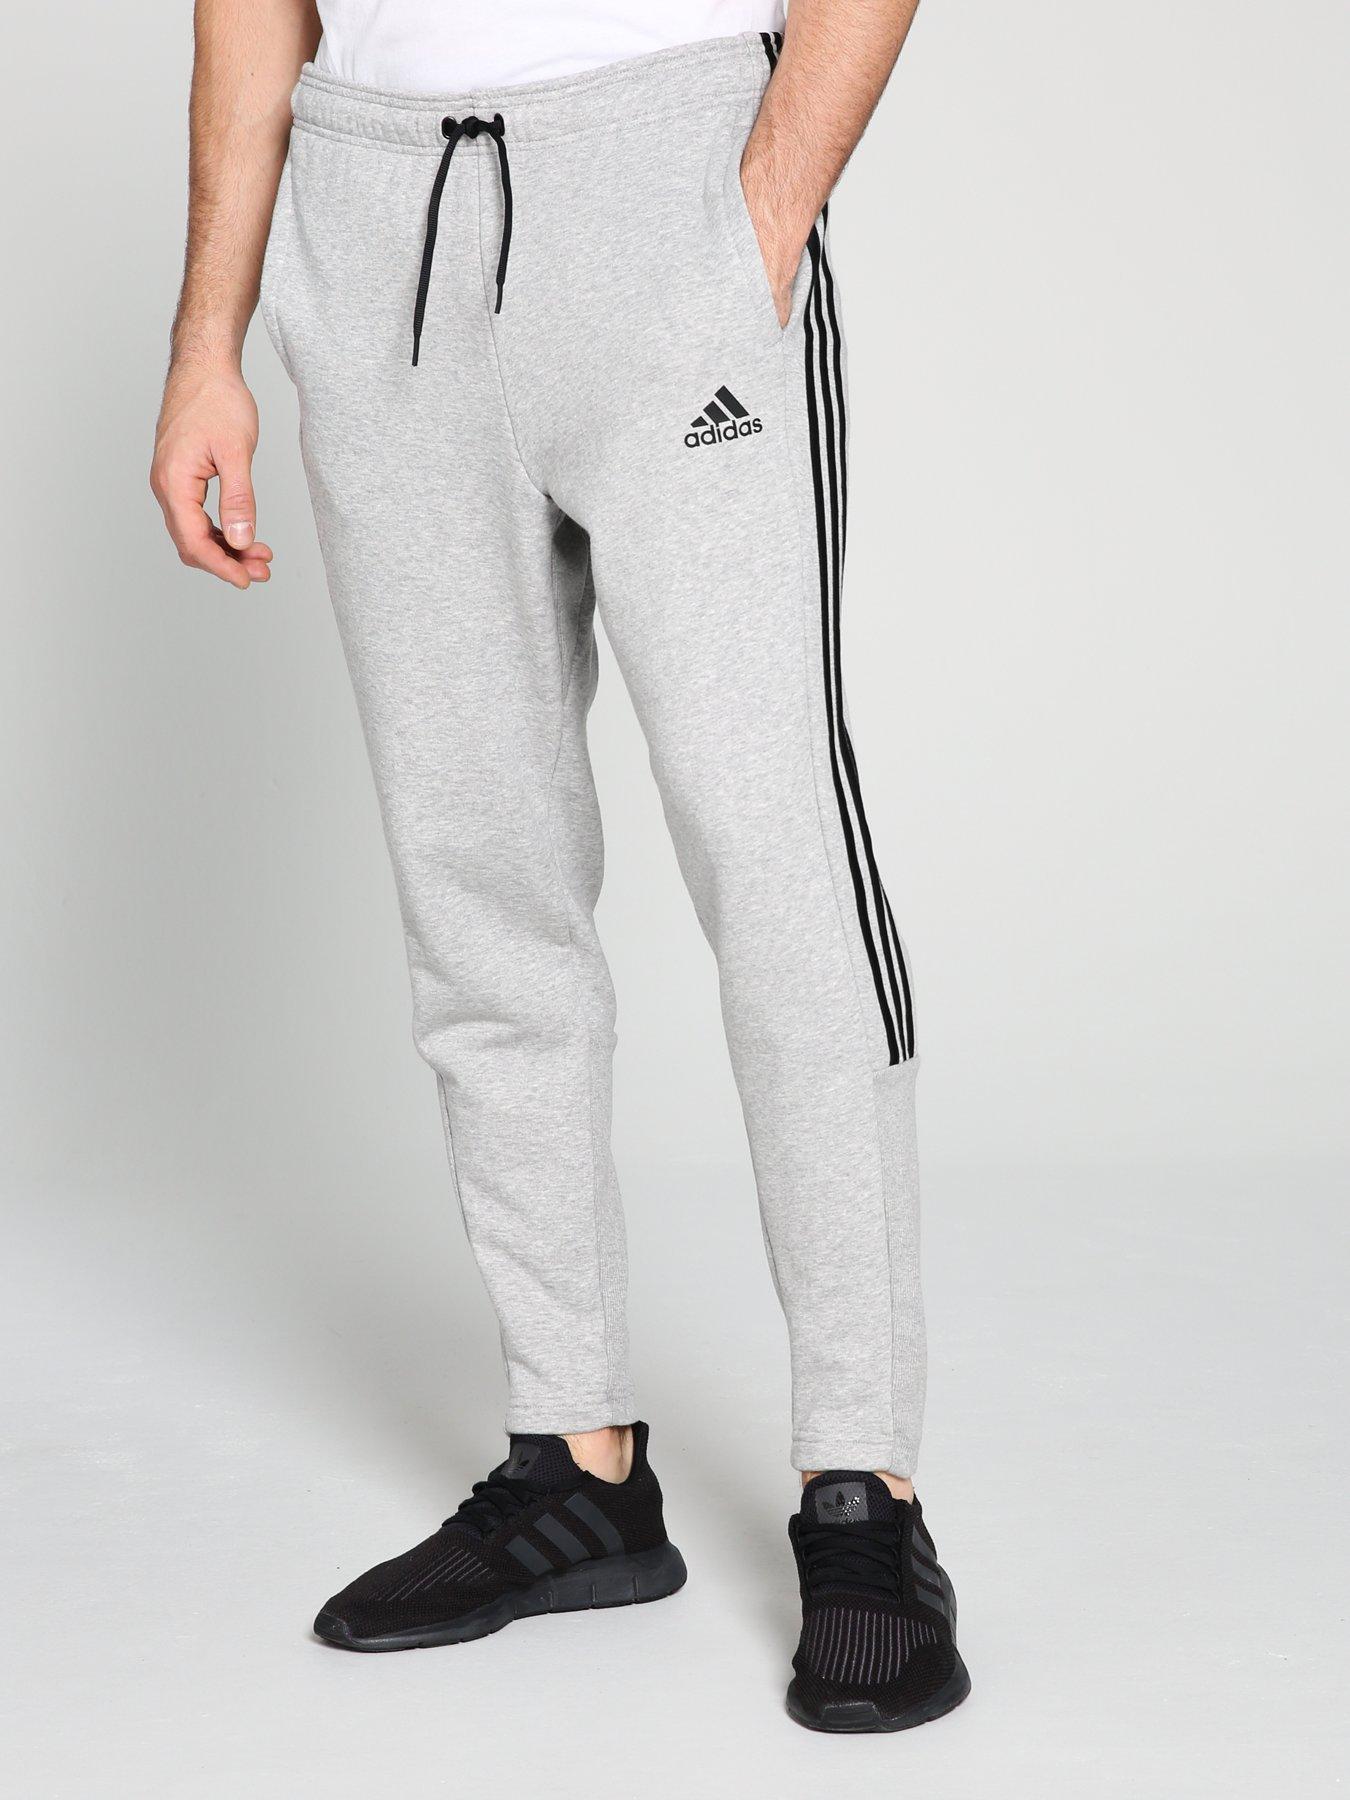 Adidas | Trousers & chinos | Men | littlewoodsireland.ie